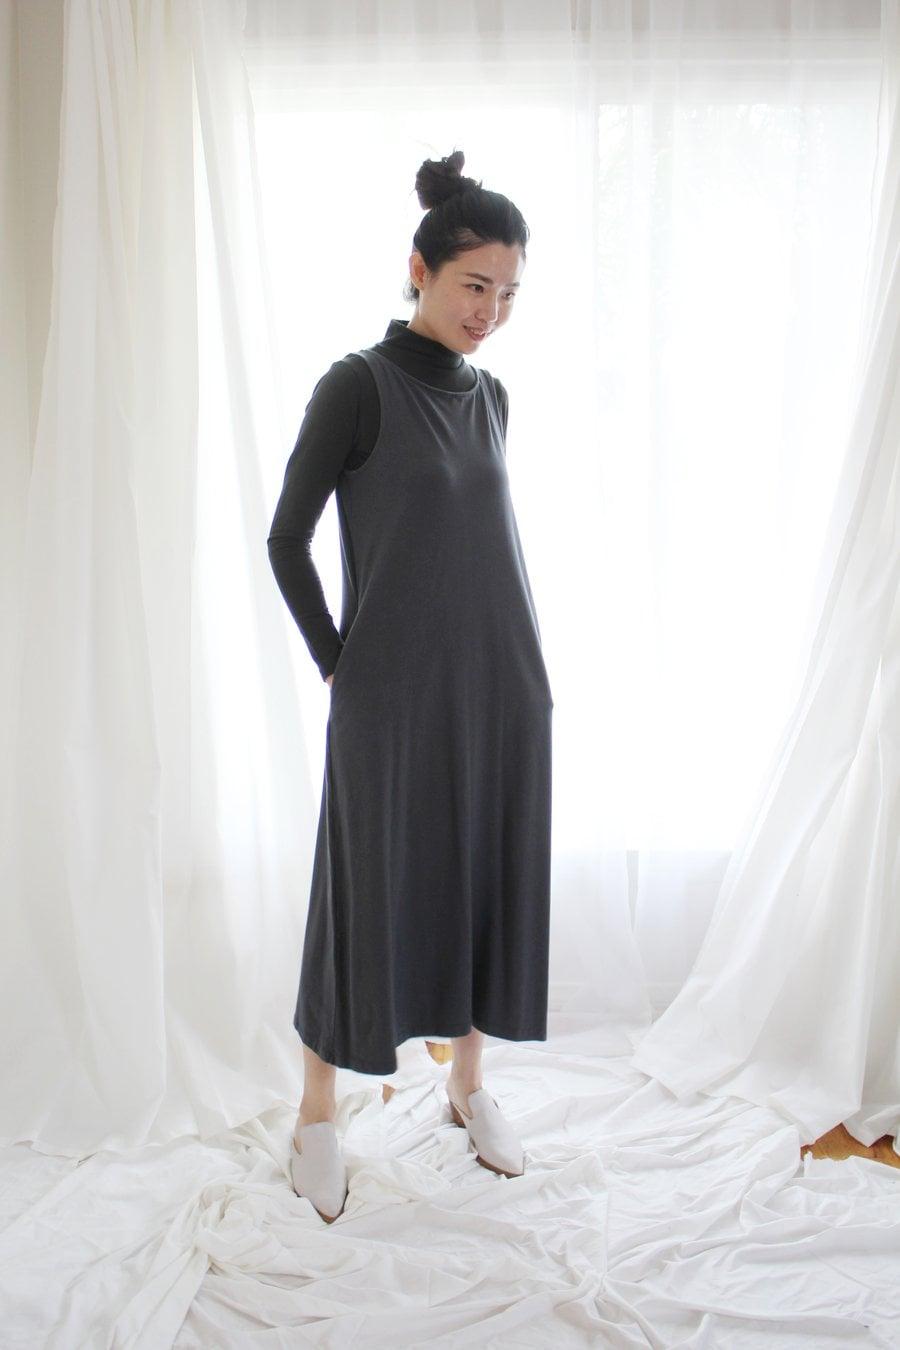 Mien Studios Cute Maternity Clothing Popsugar Family